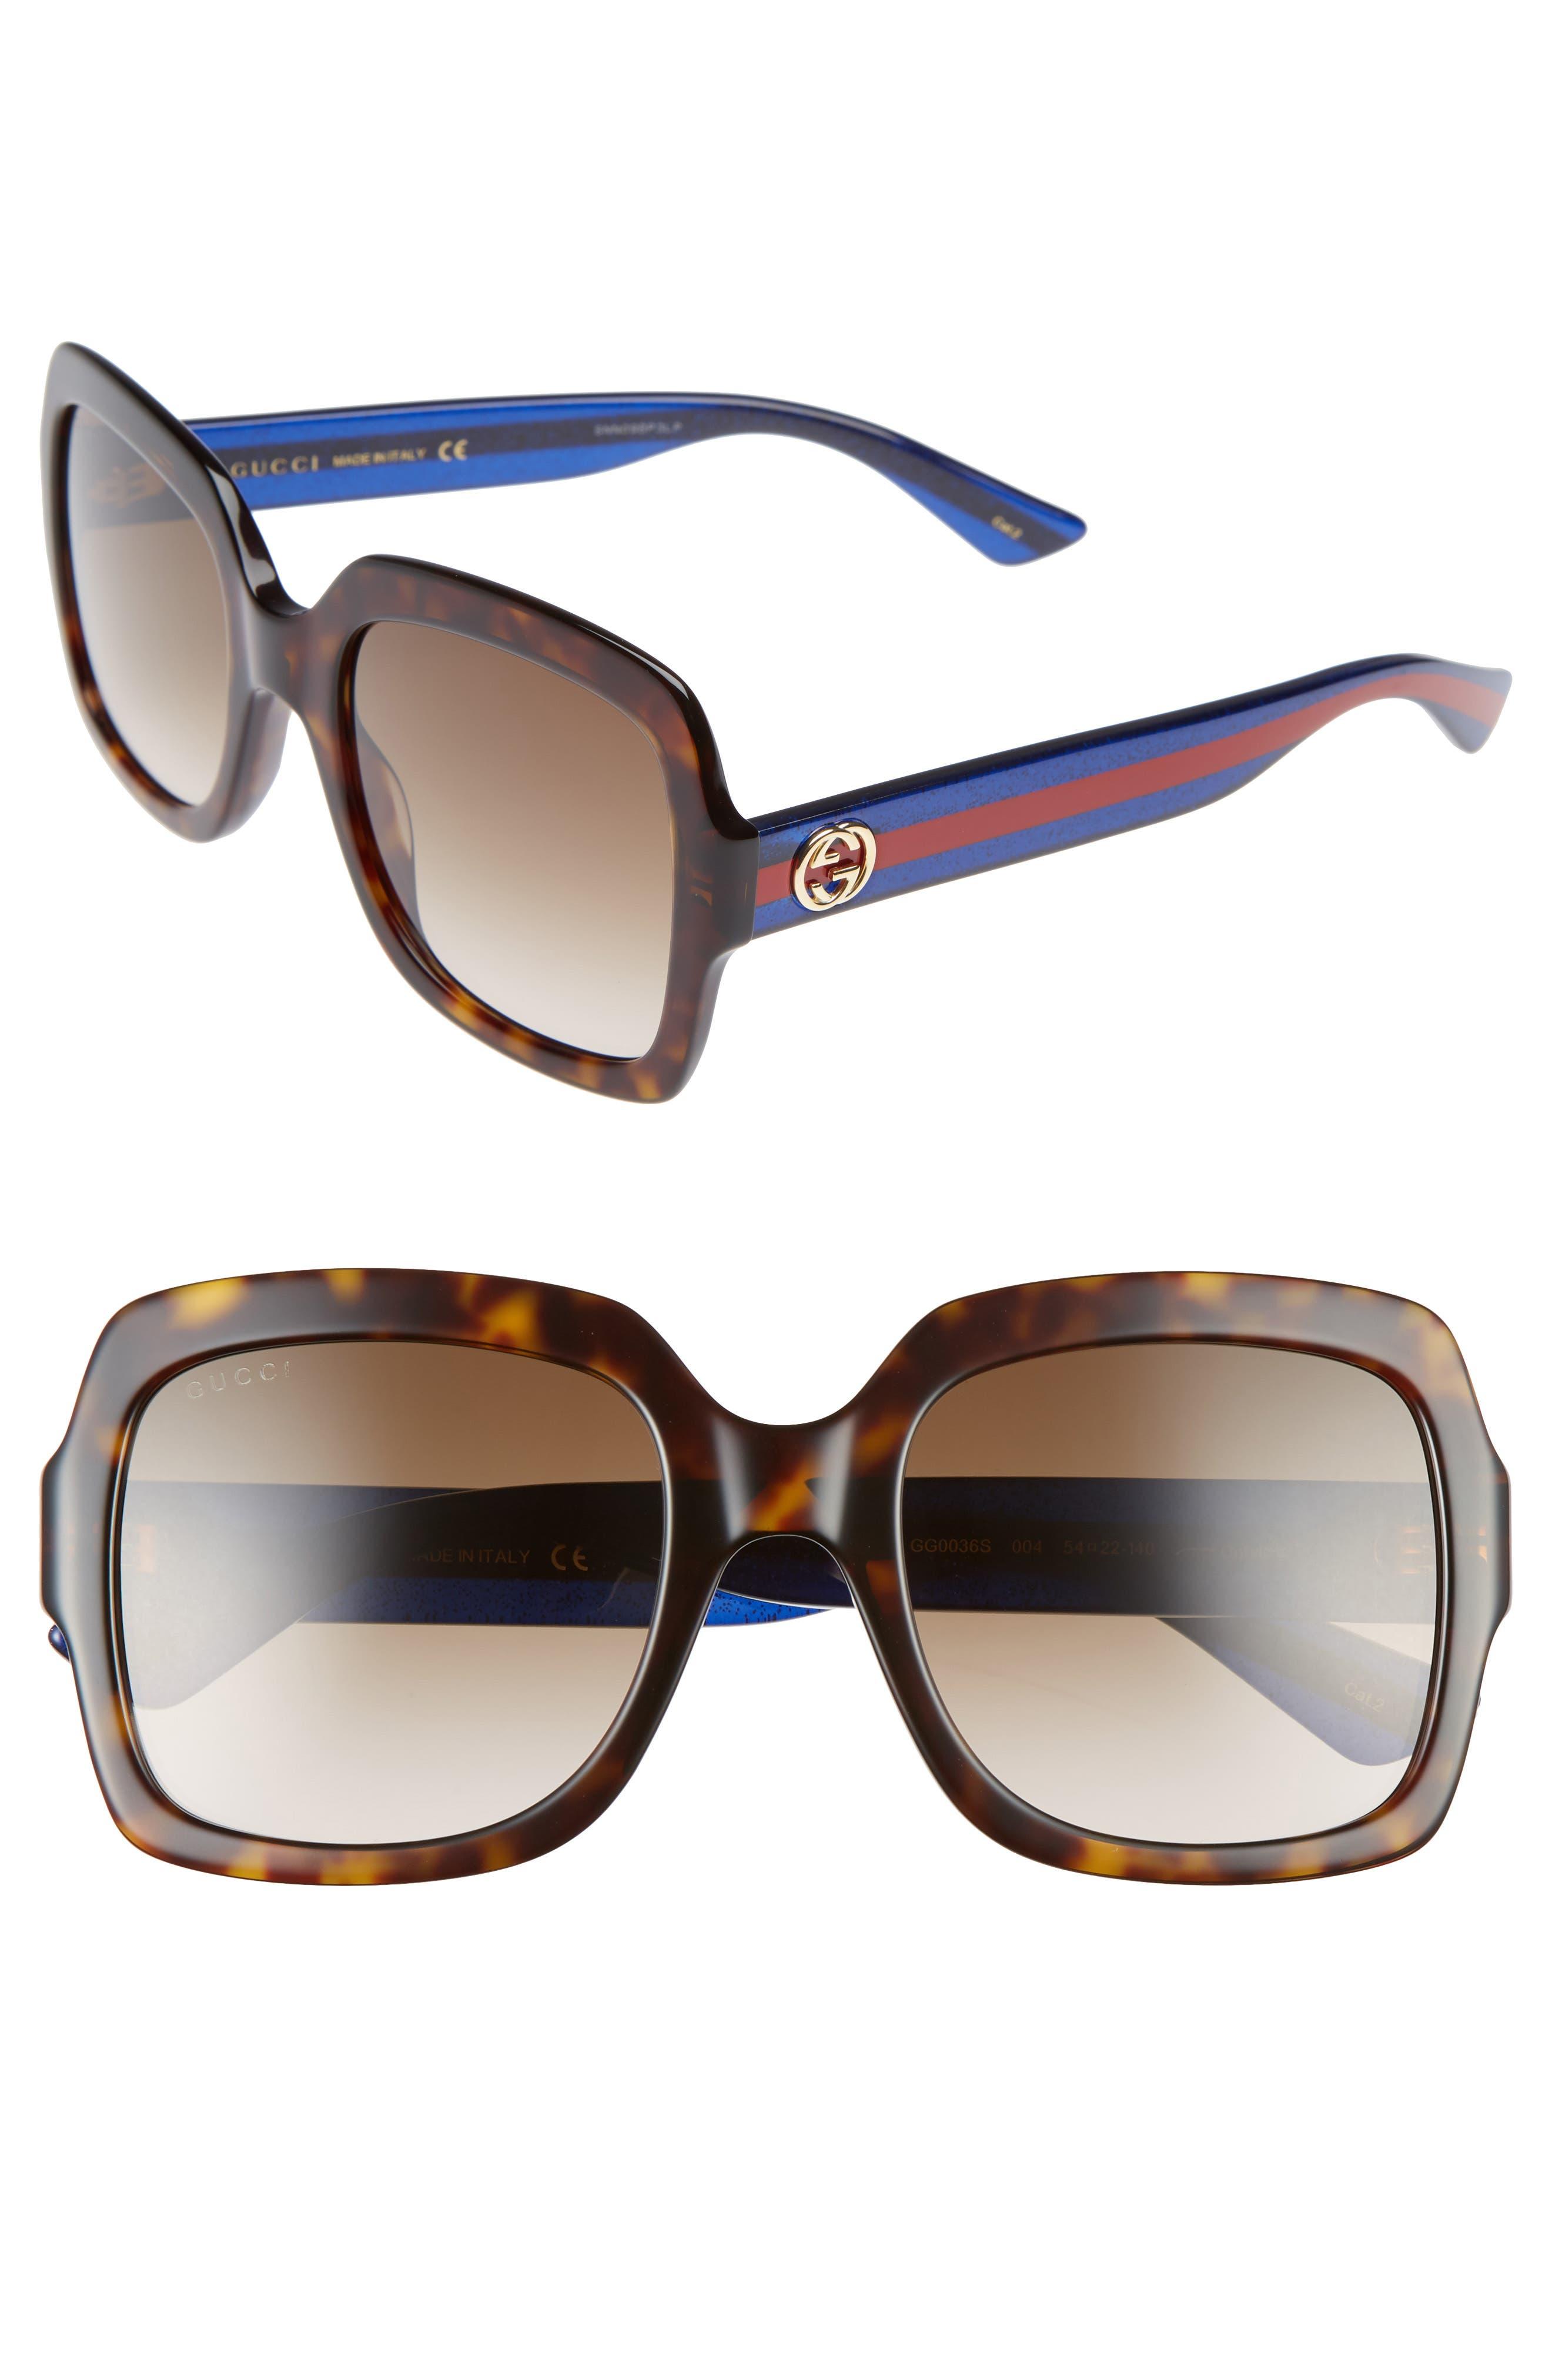 GUCCI,                             54mm Square Sunglasses,                             Main thumbnail 1, color,                             200